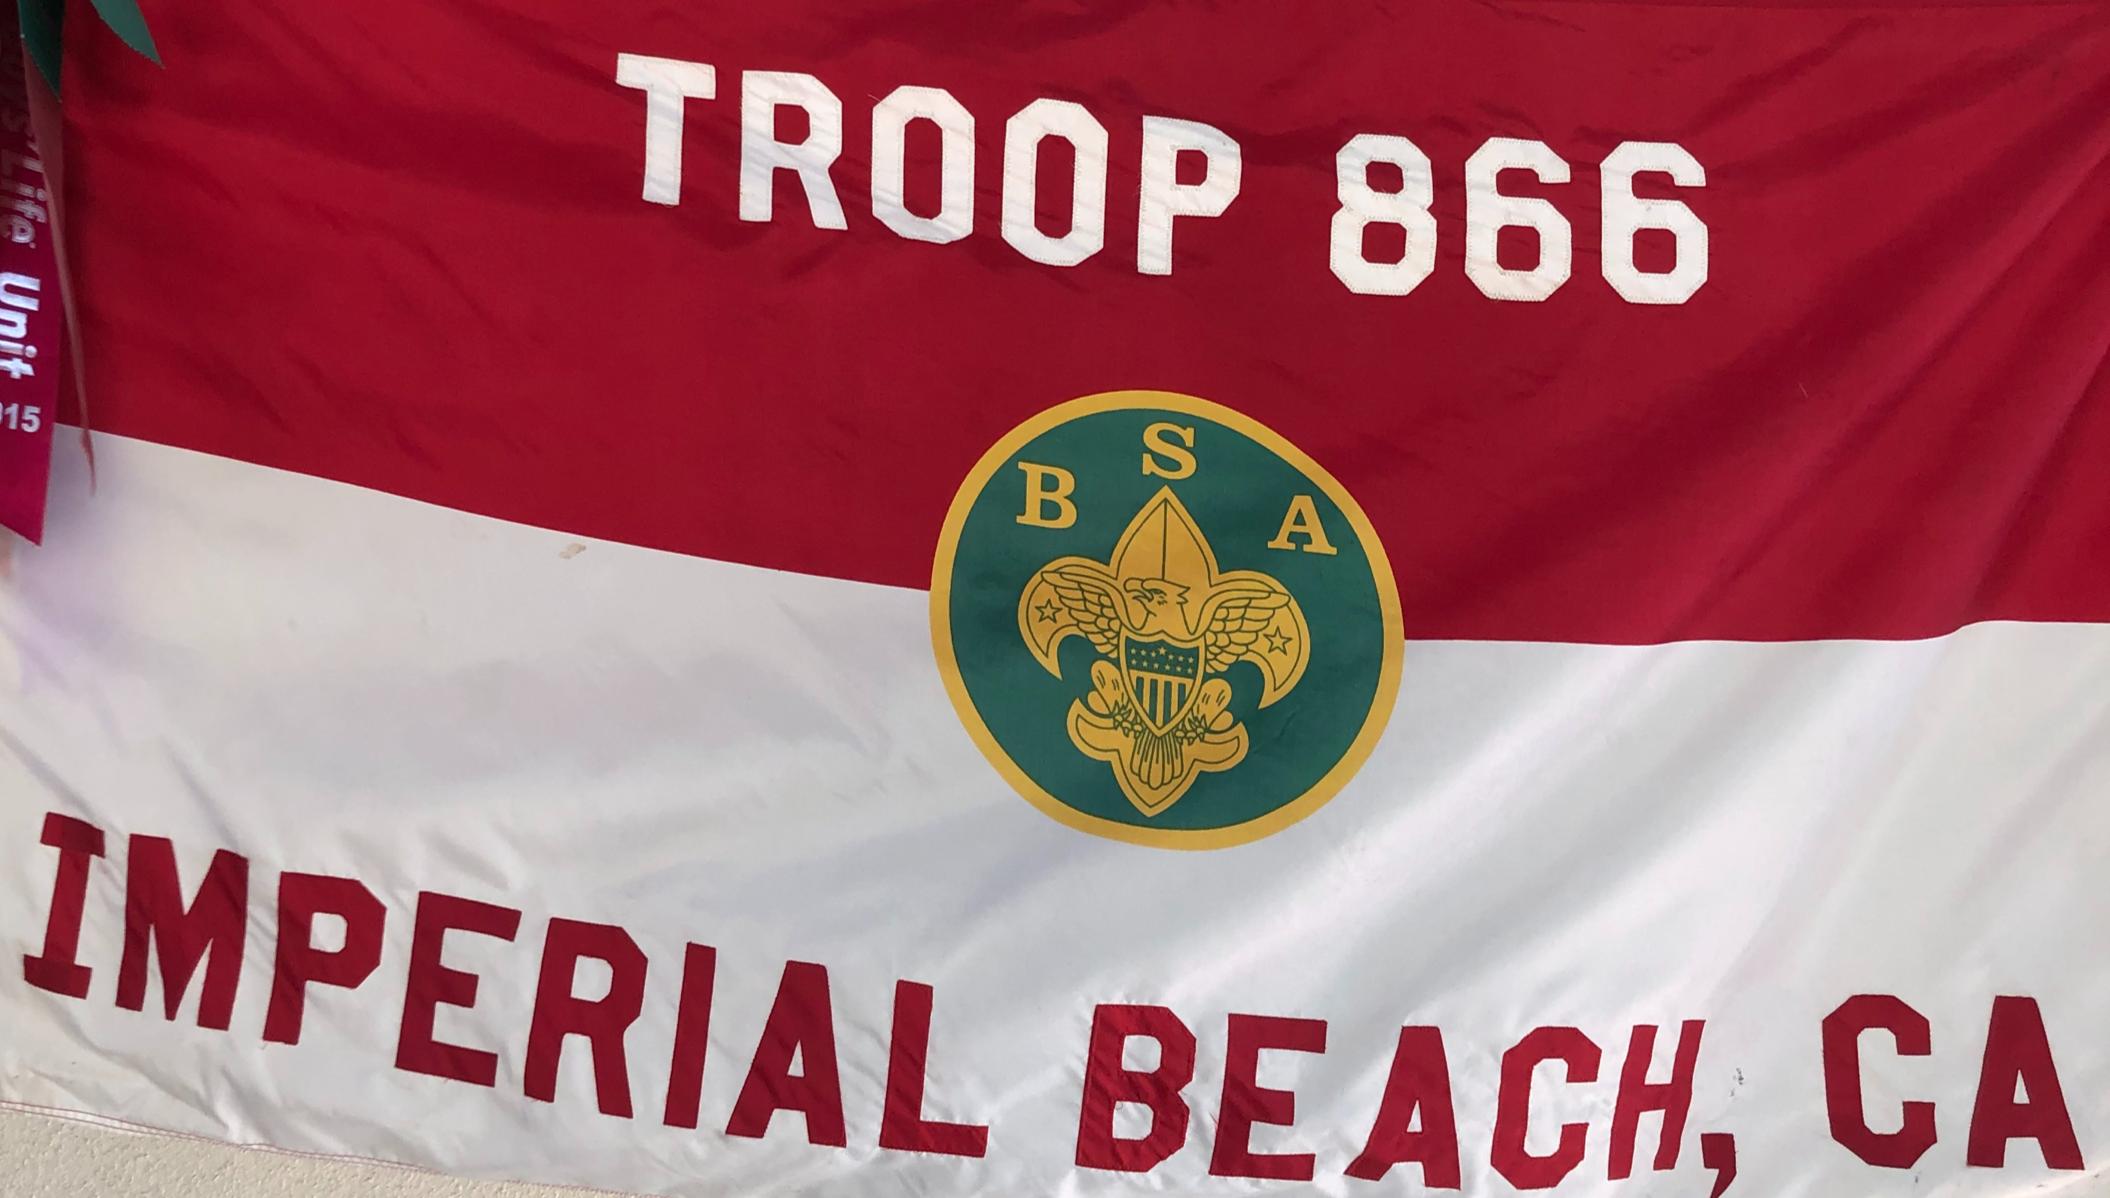 Imperial Beach Scots